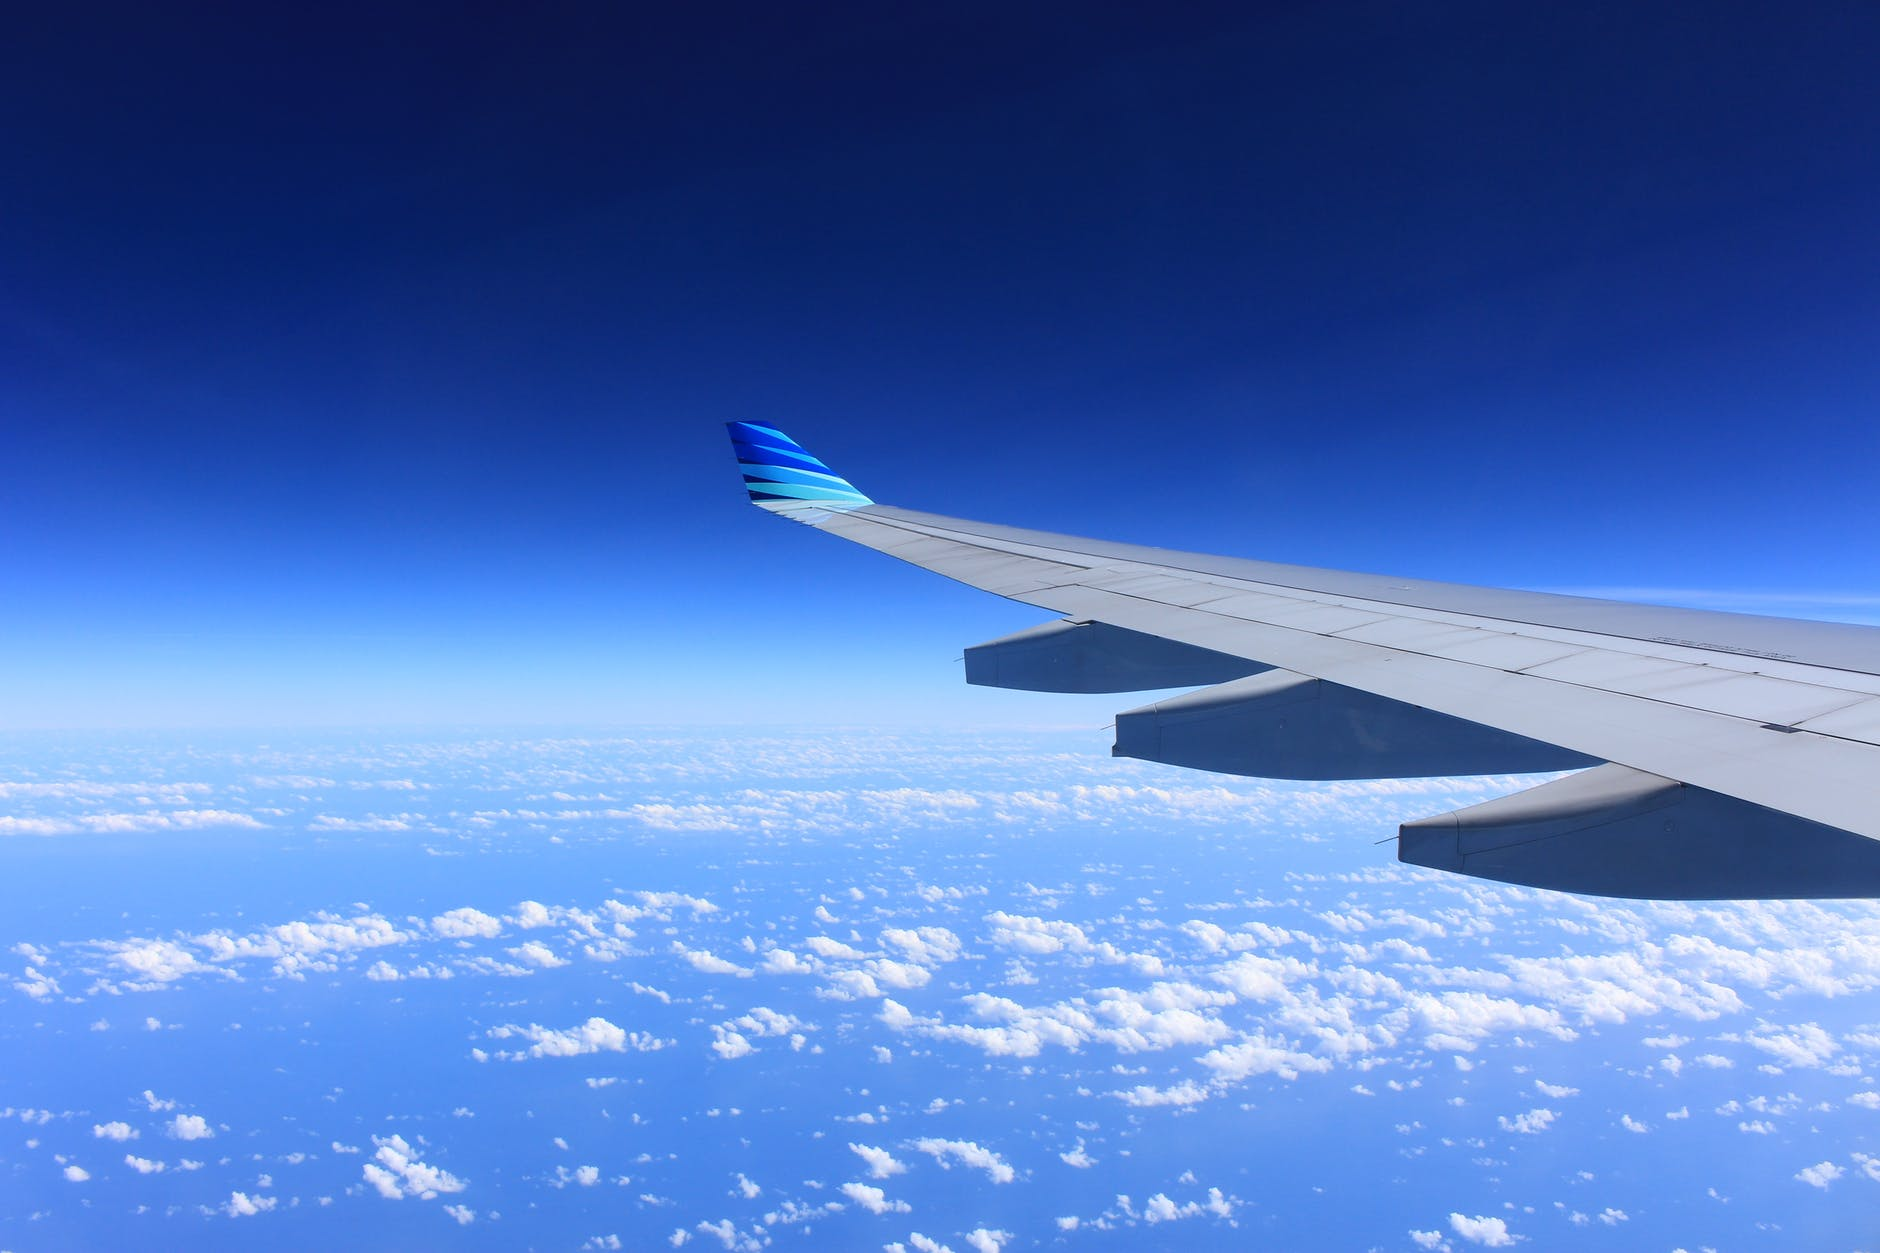 gray plane wing